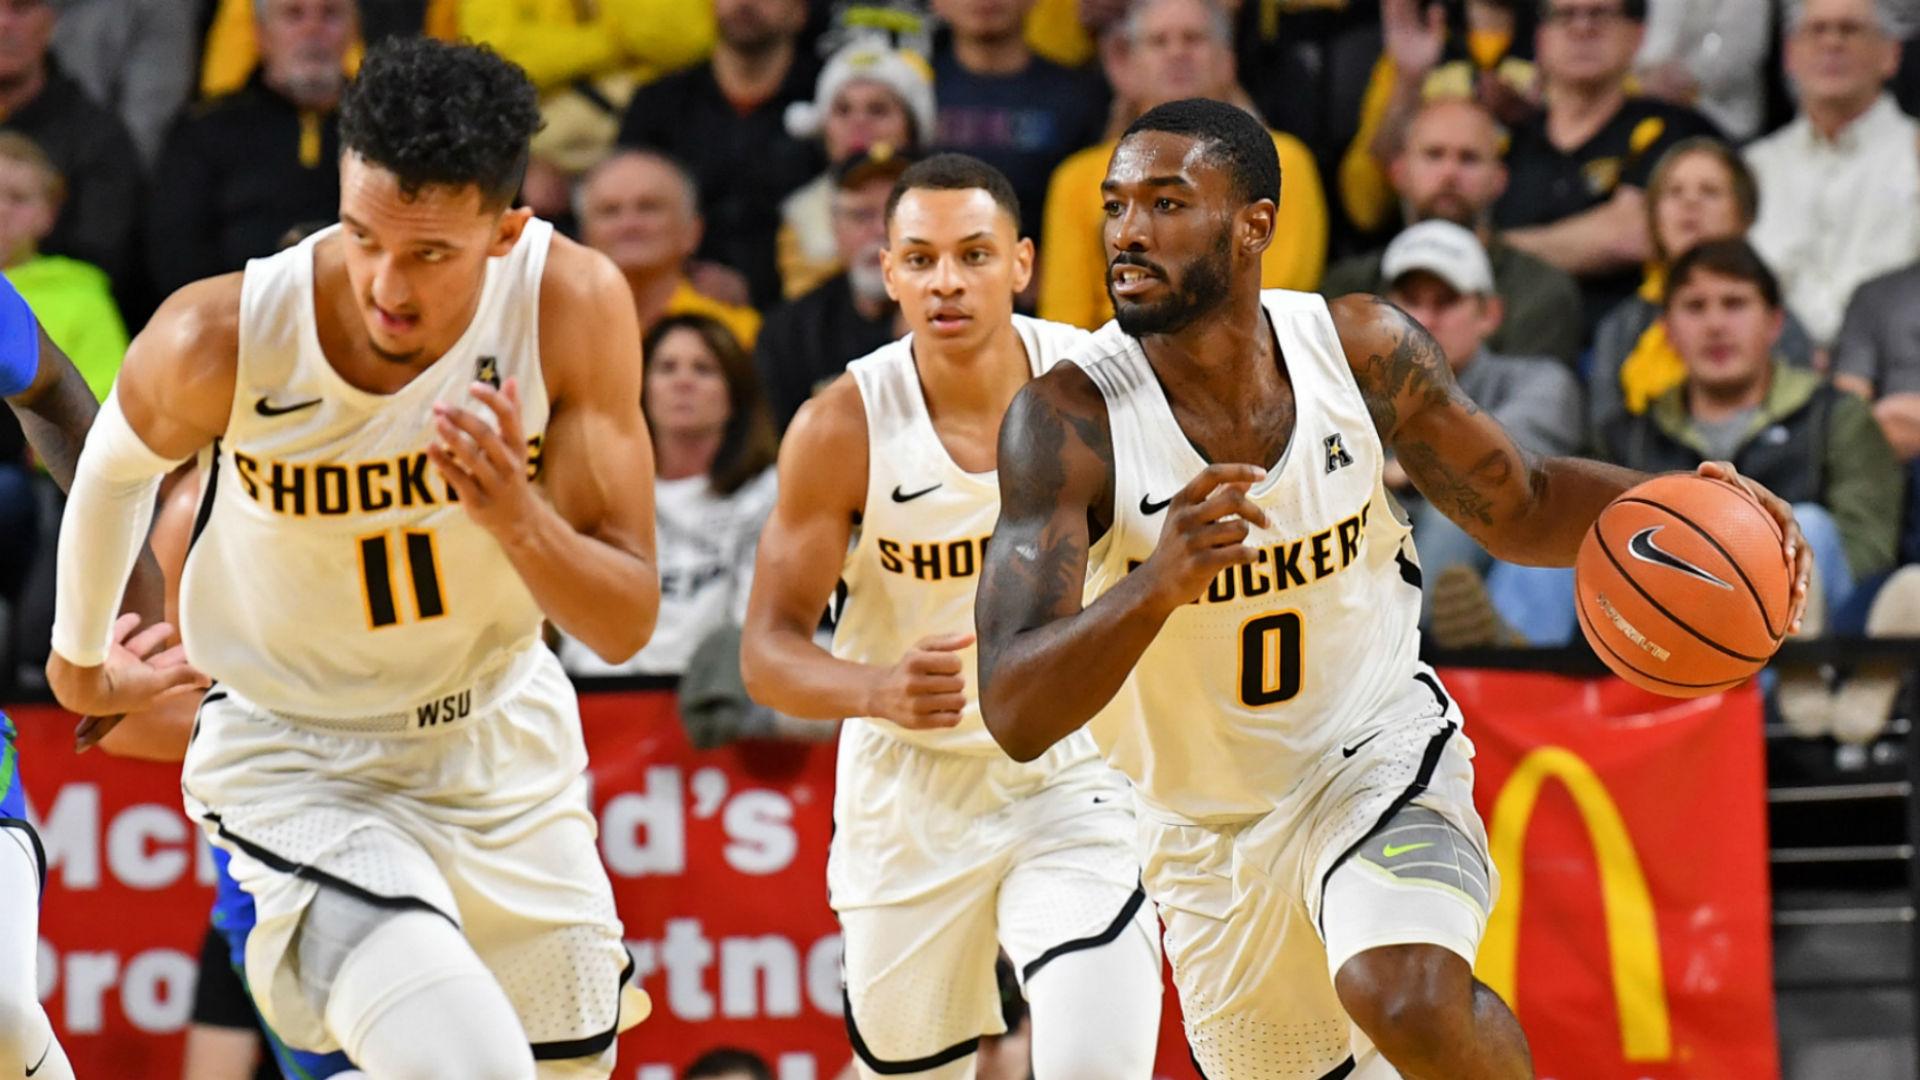 NBA Draft tracker: Pair of UW Huskies, Gonzaga duo selected